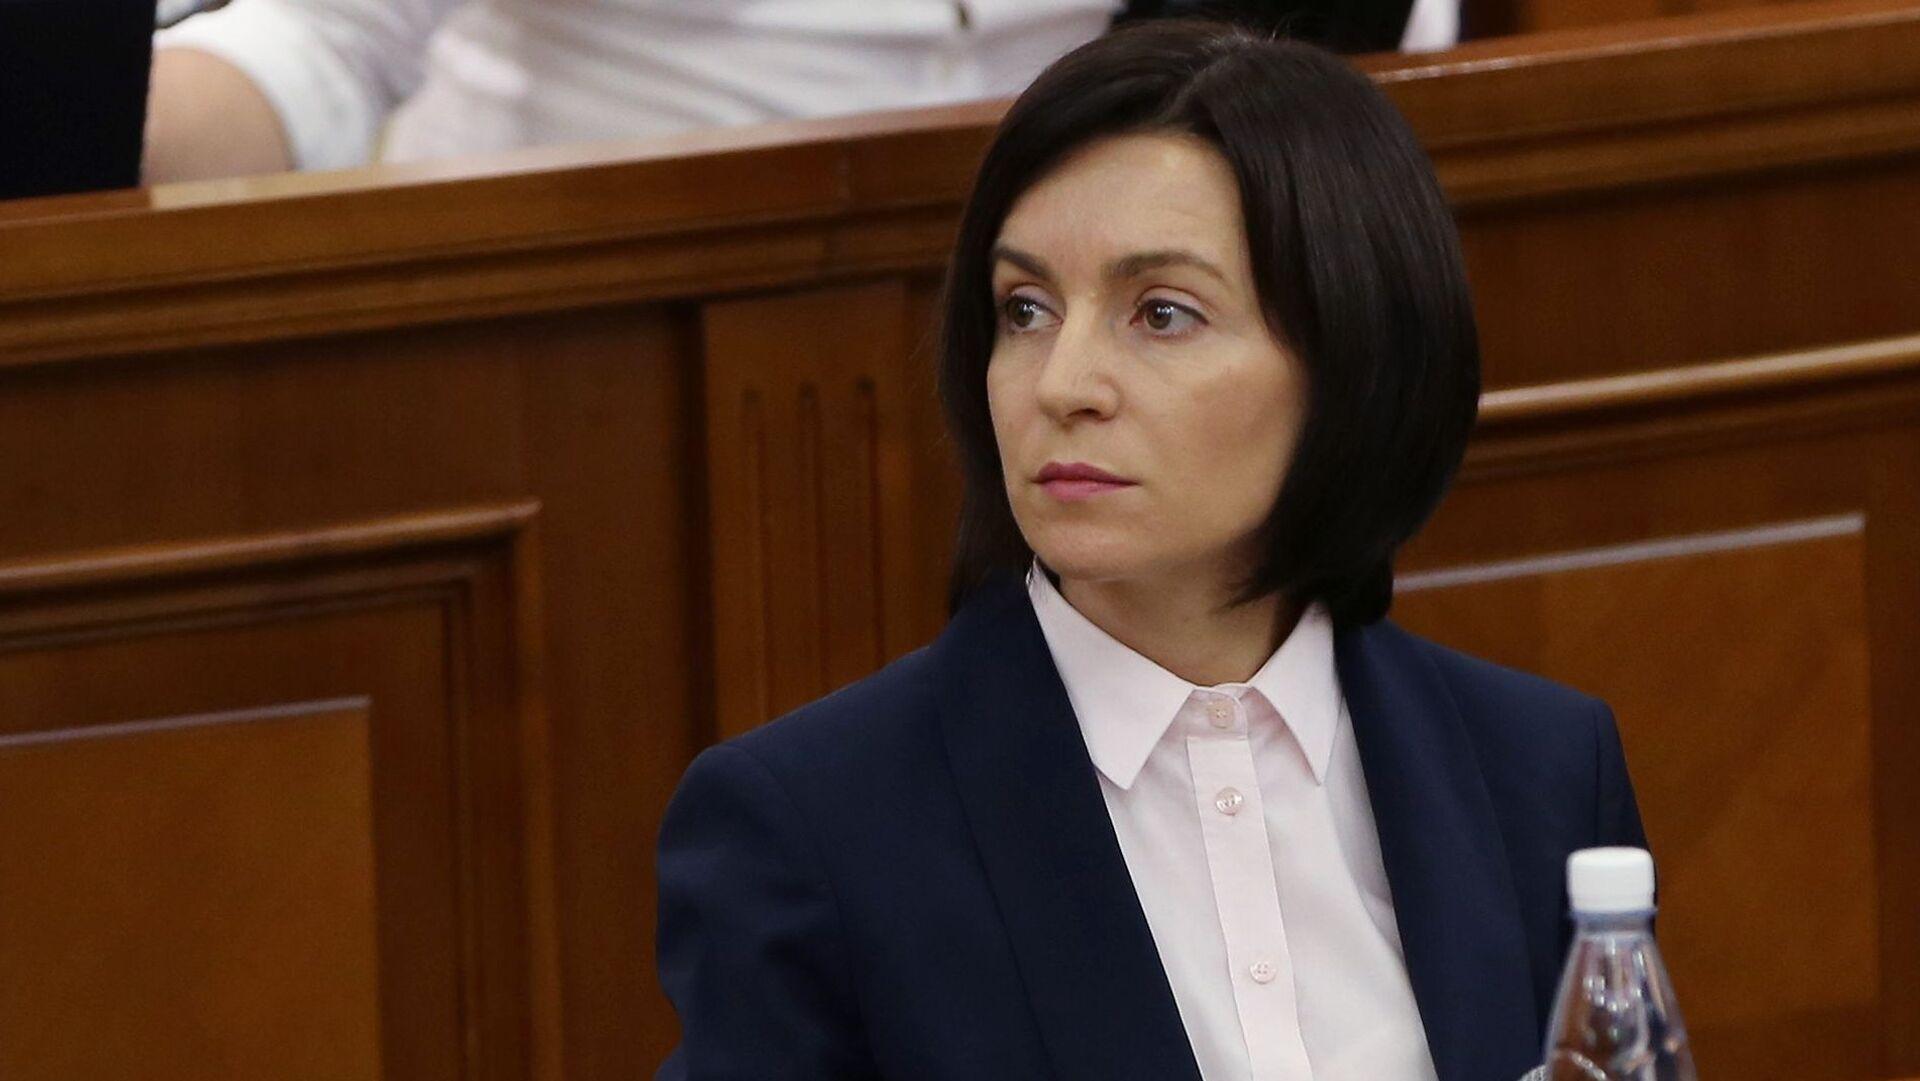 Maia Sandu, presidenta electa de Moldavia - Sputnik Mundo, 1920, 18.03.2021